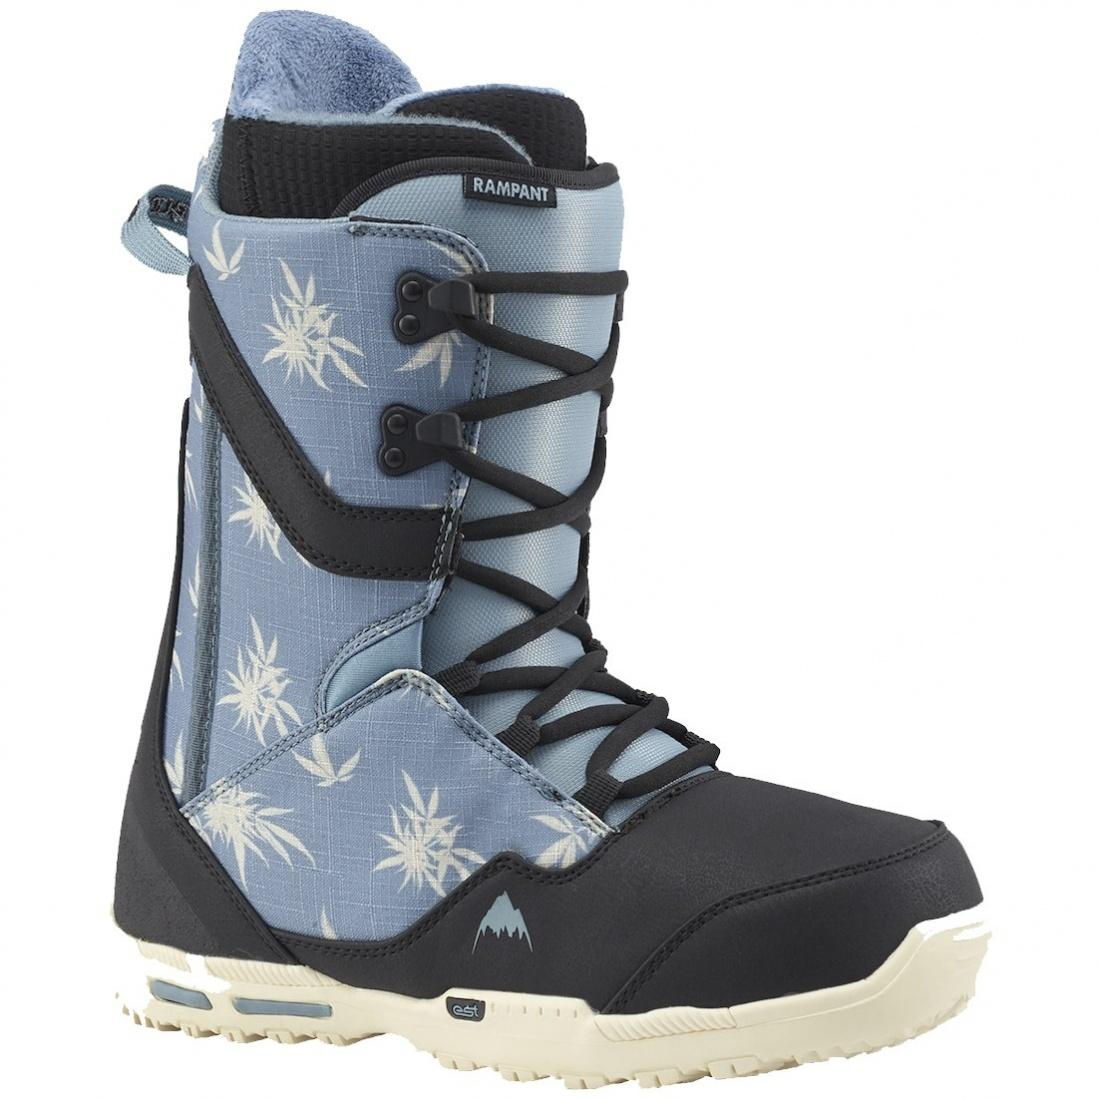 Ботинки для сноуборда Burton Rampant Tropical Trip, , , FW18 10